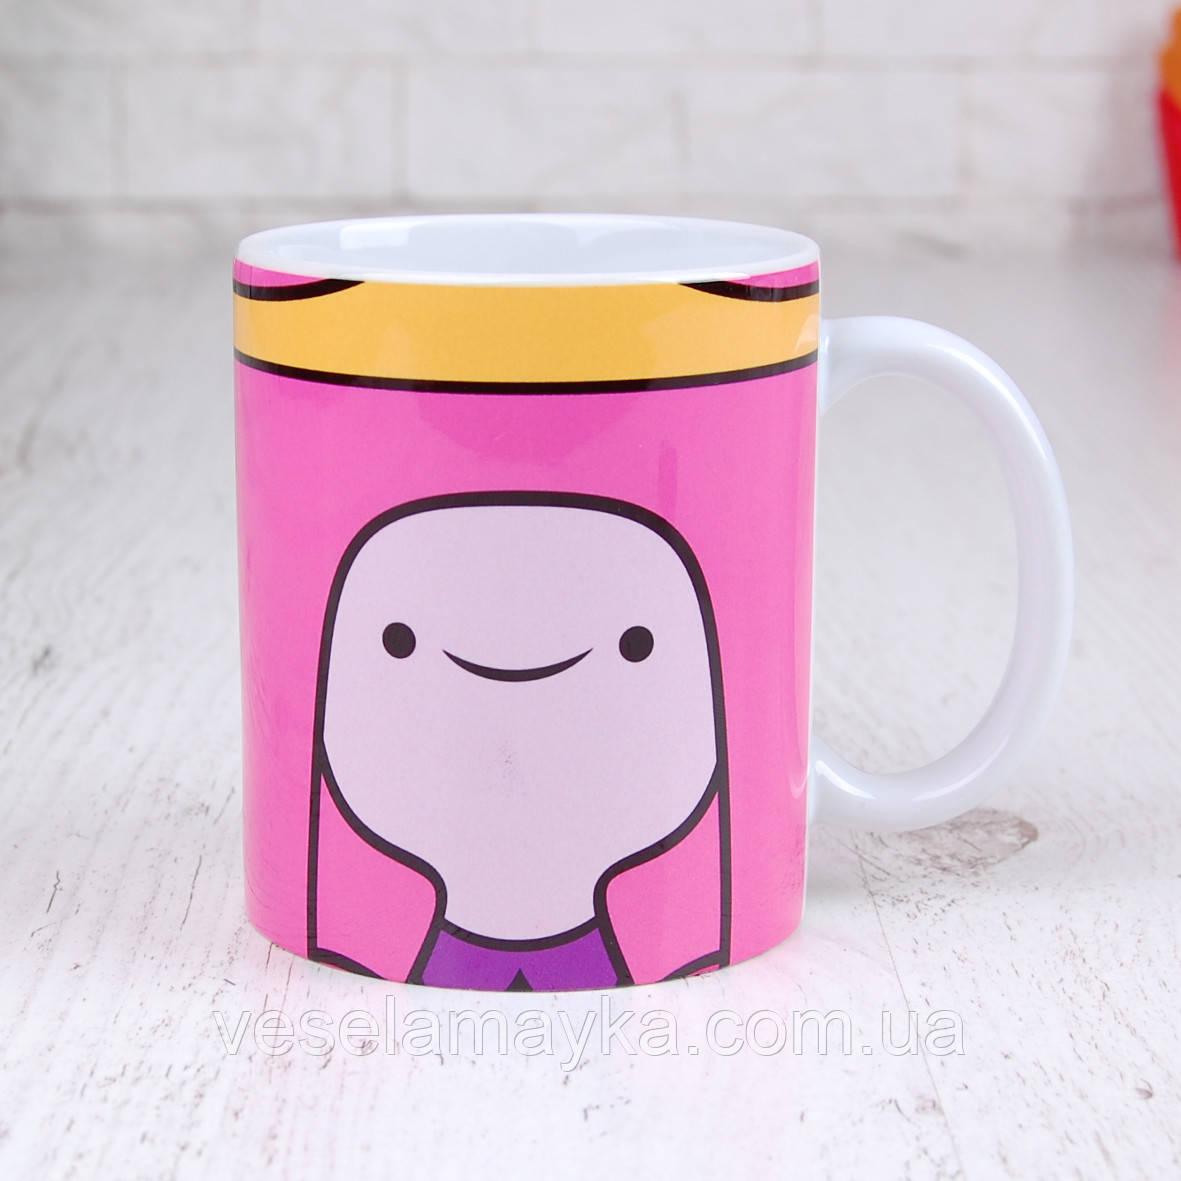 Чашка Принцеса Бубльгум (Жуйка) 2